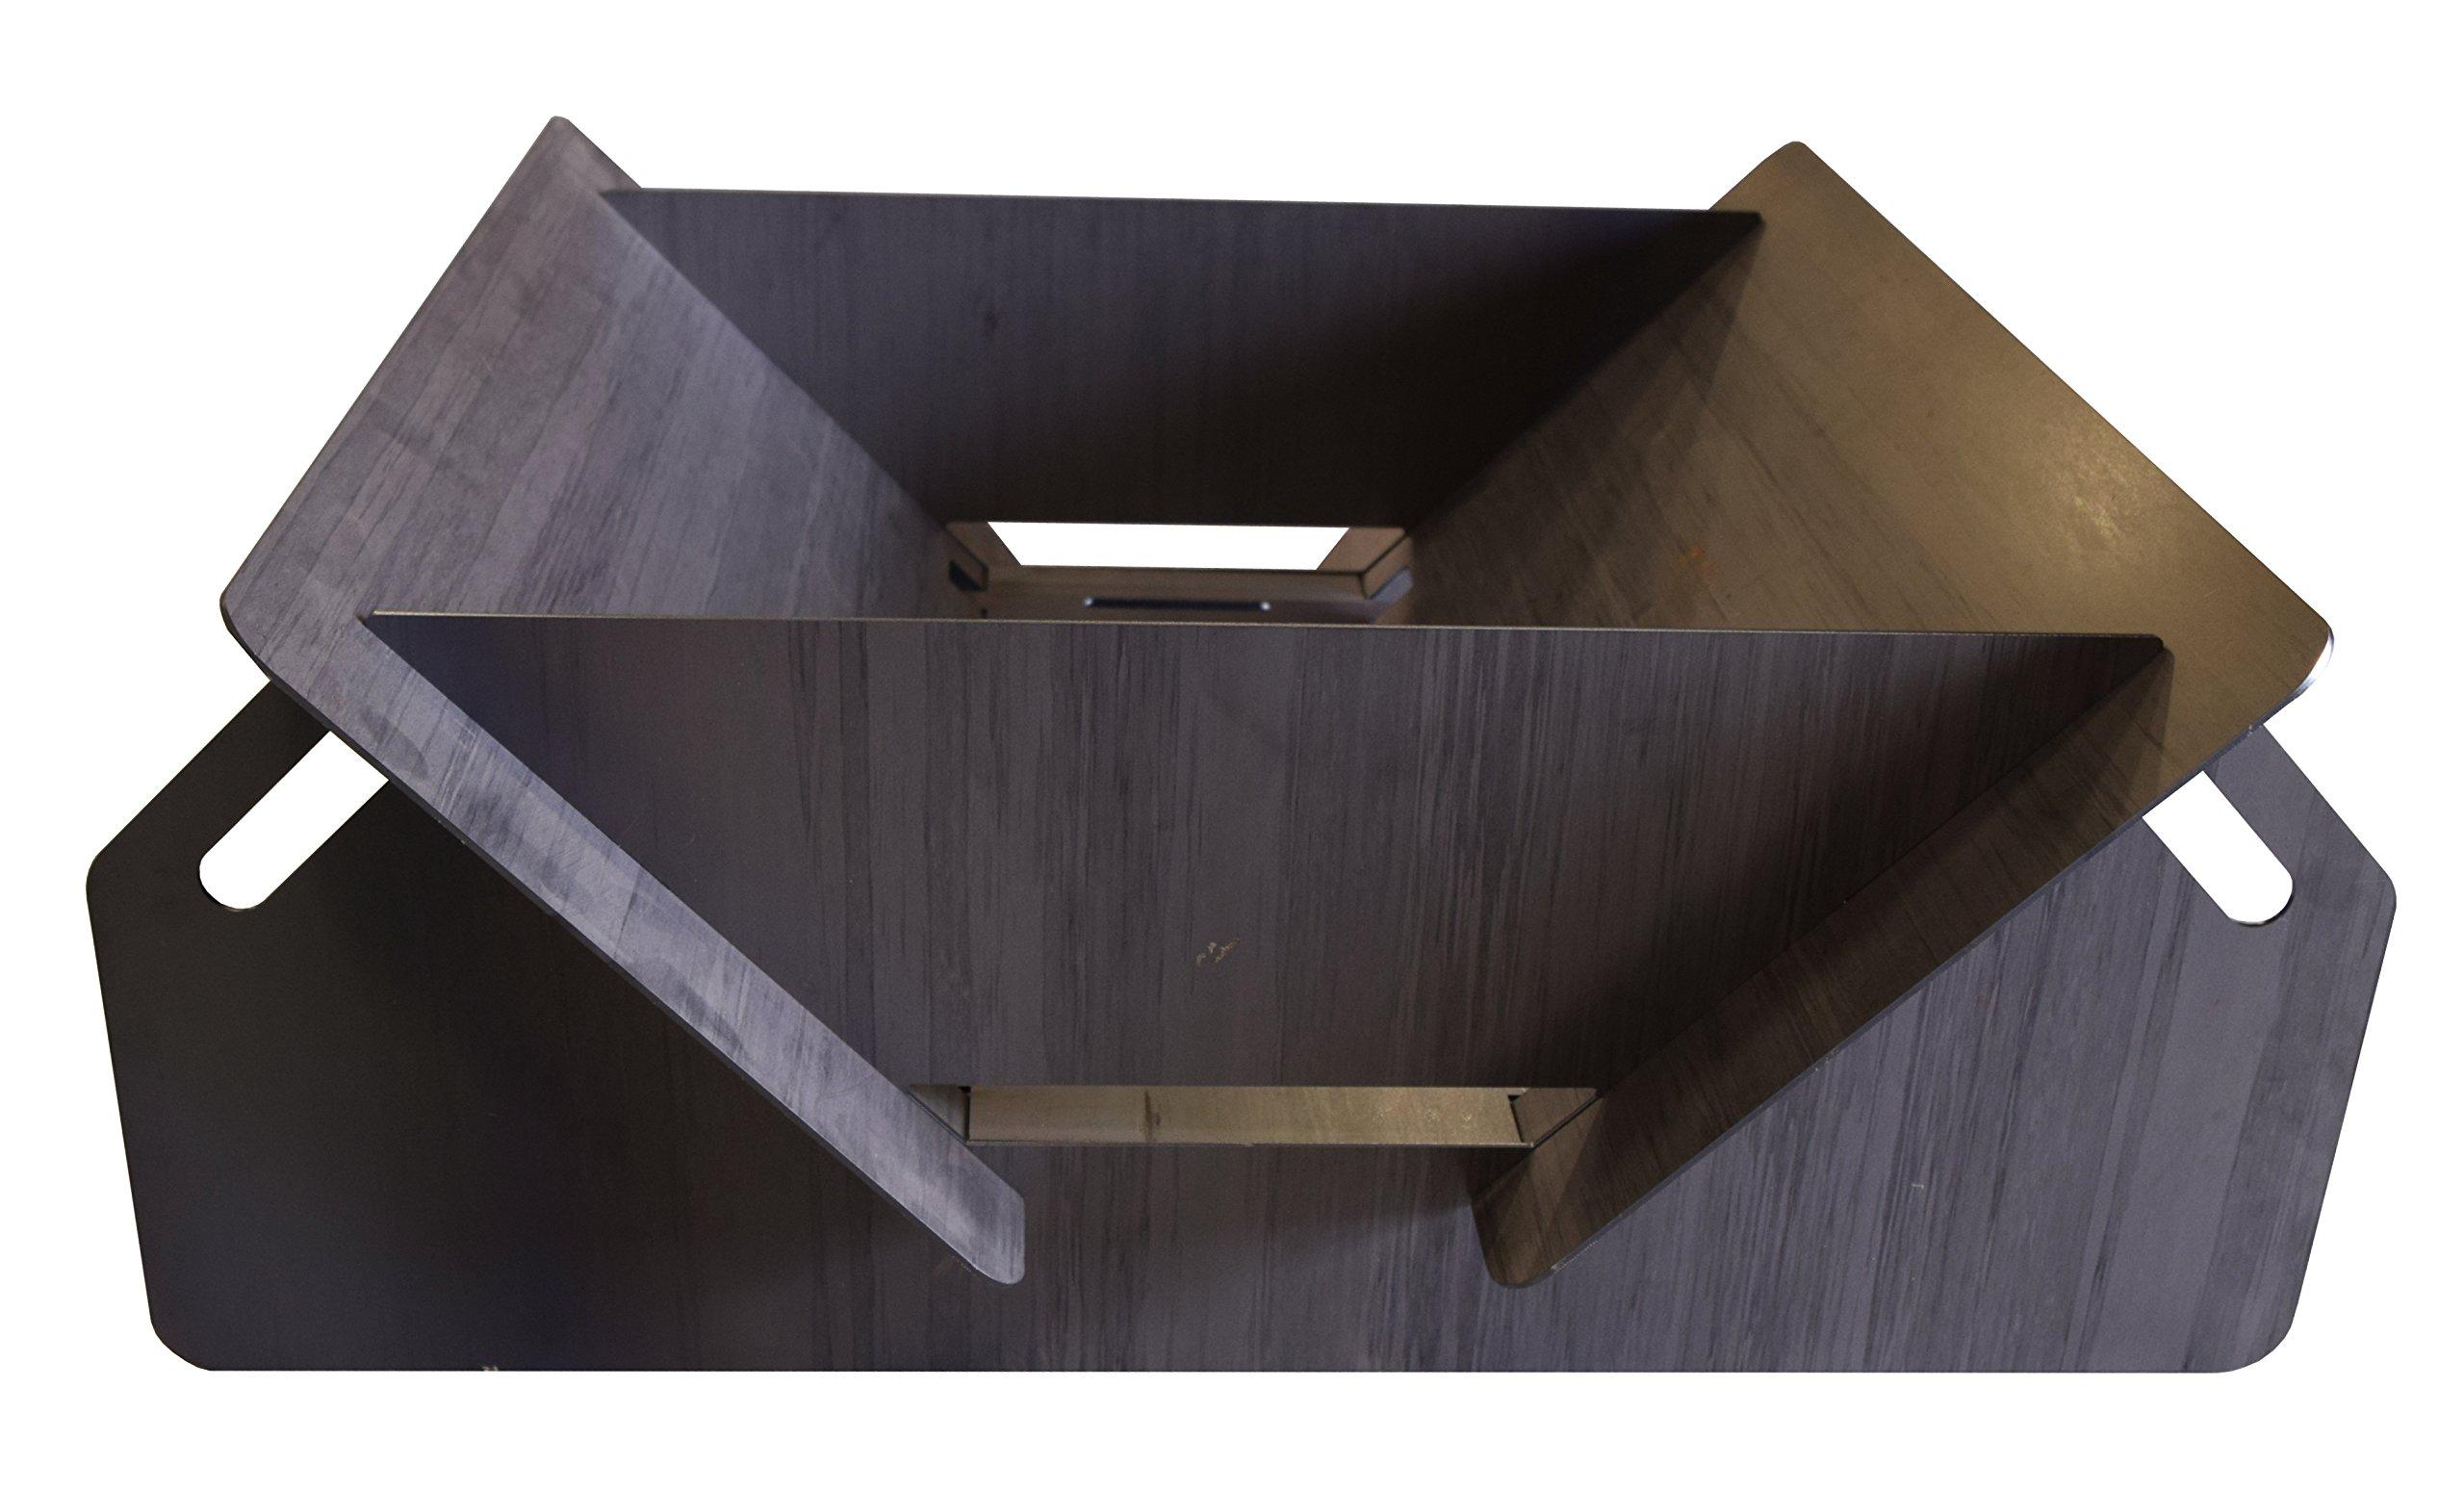 RMP Fire Box - Universal Outdoor Fire Box by RMP